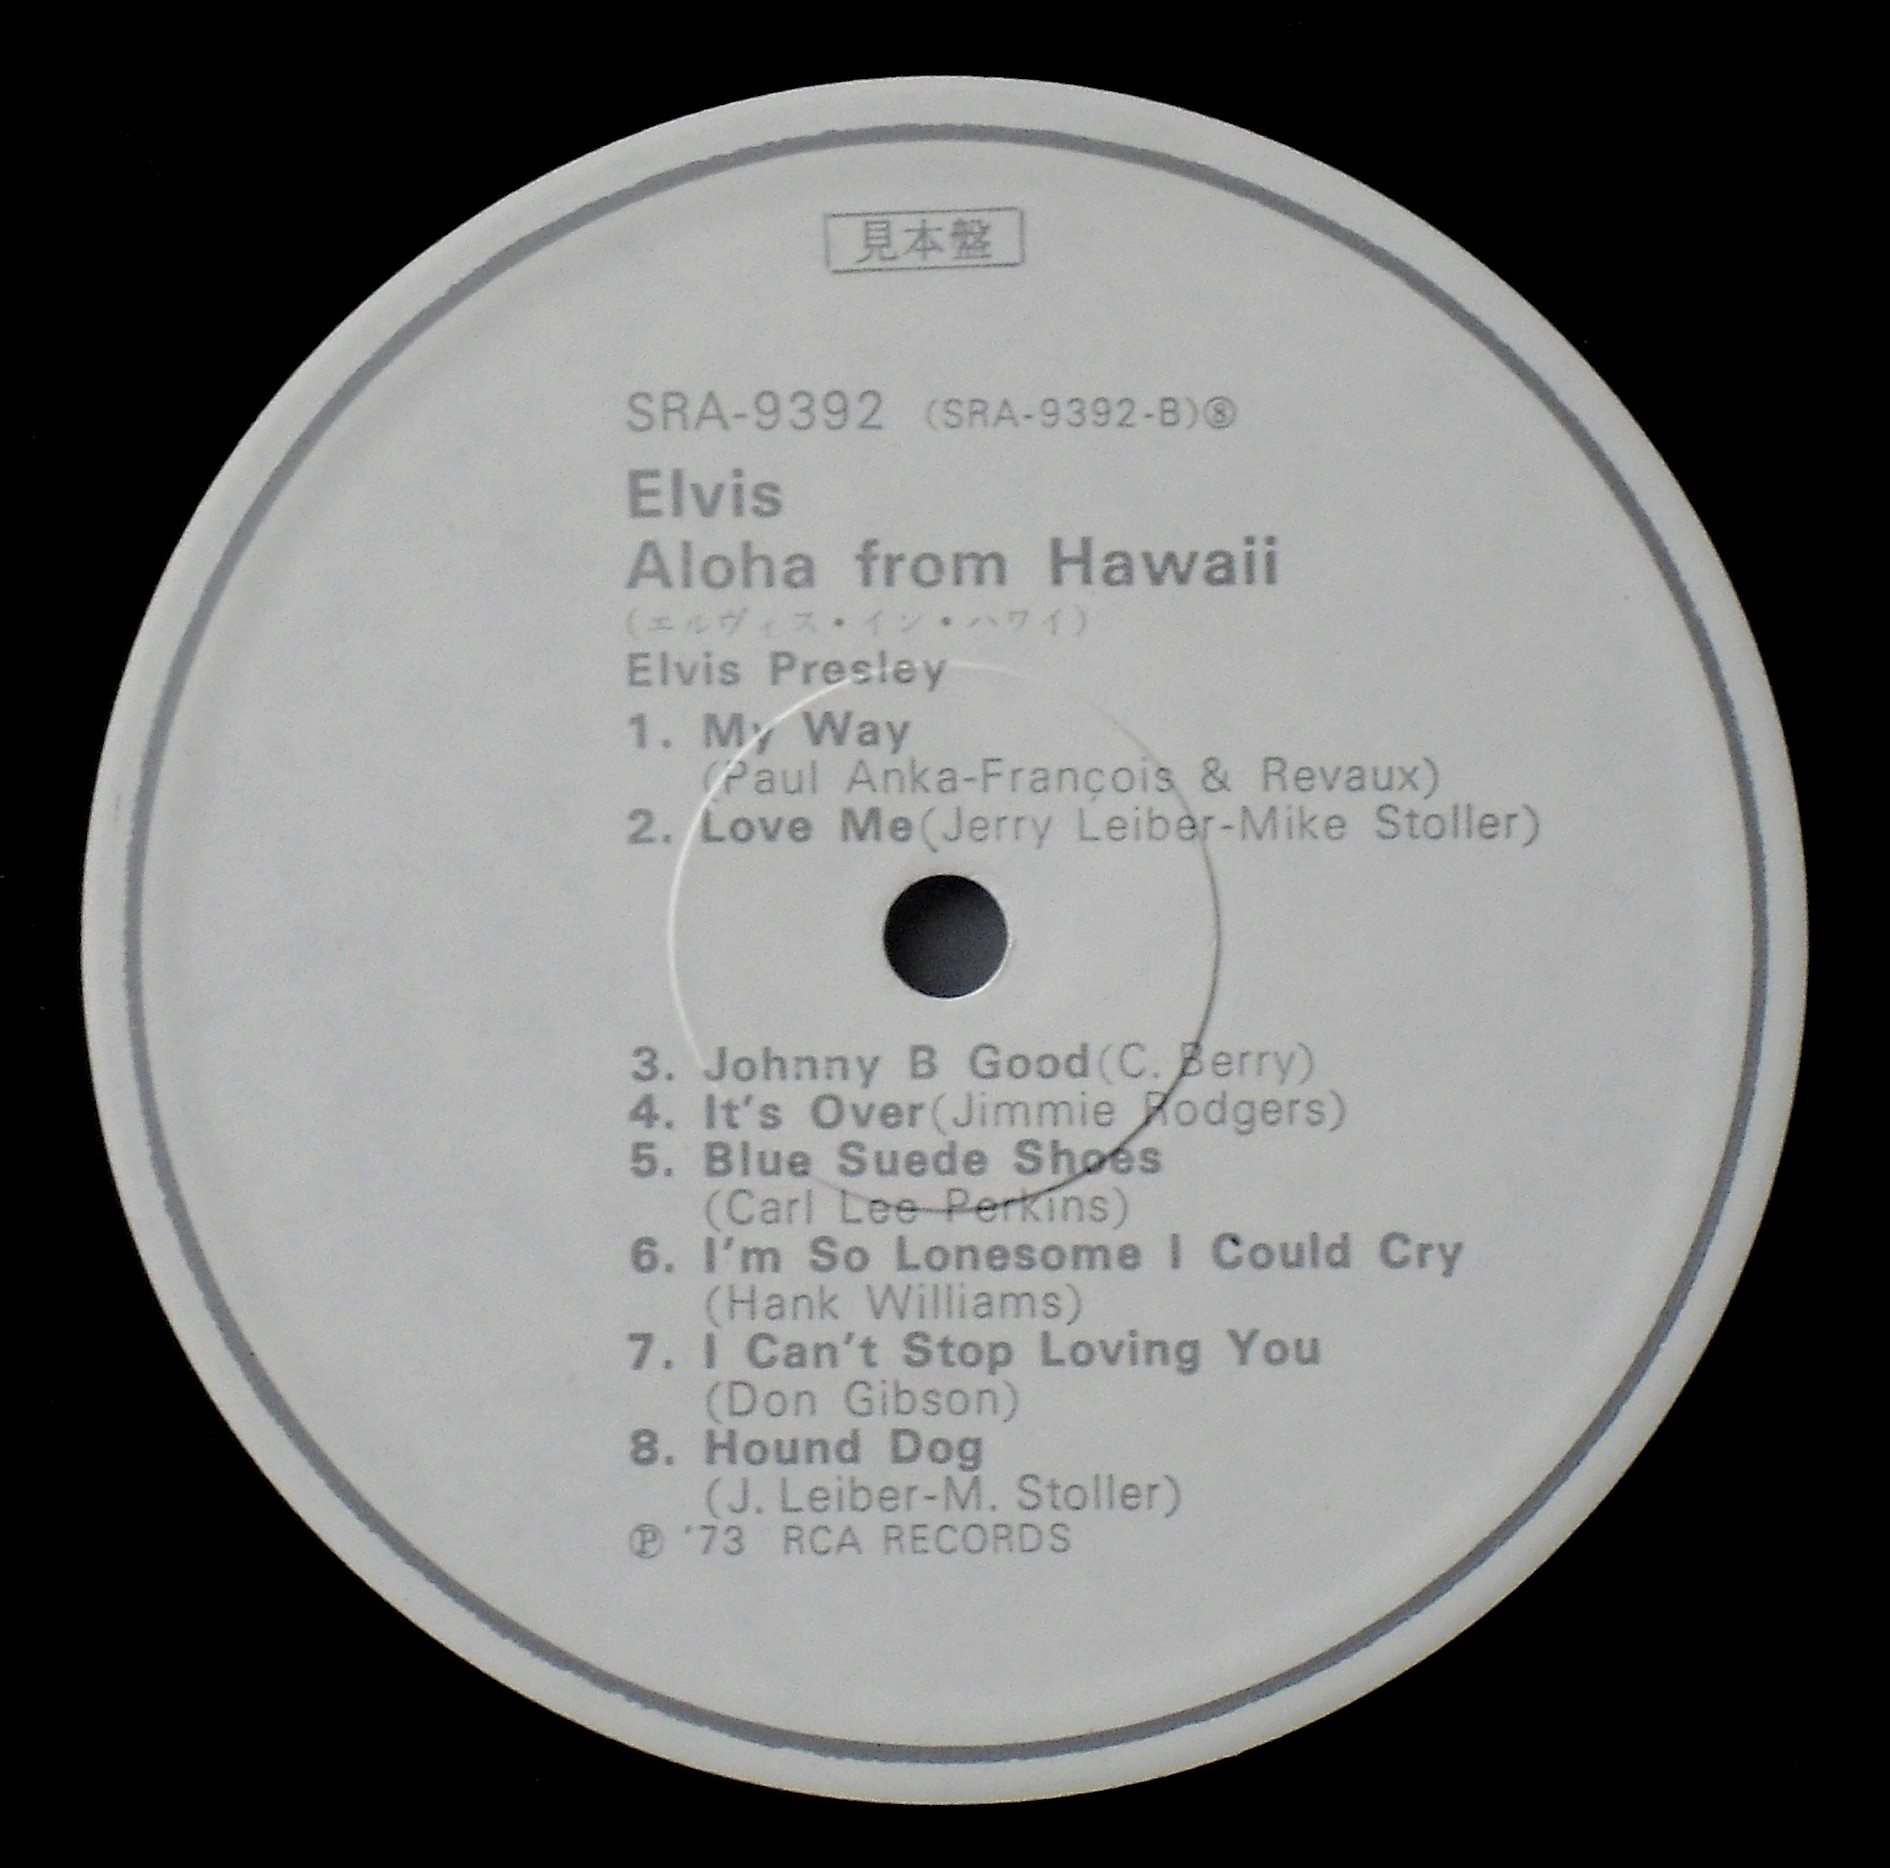 ALOHA FROM HAWAII VIA SATELLITE 04s2dhps6